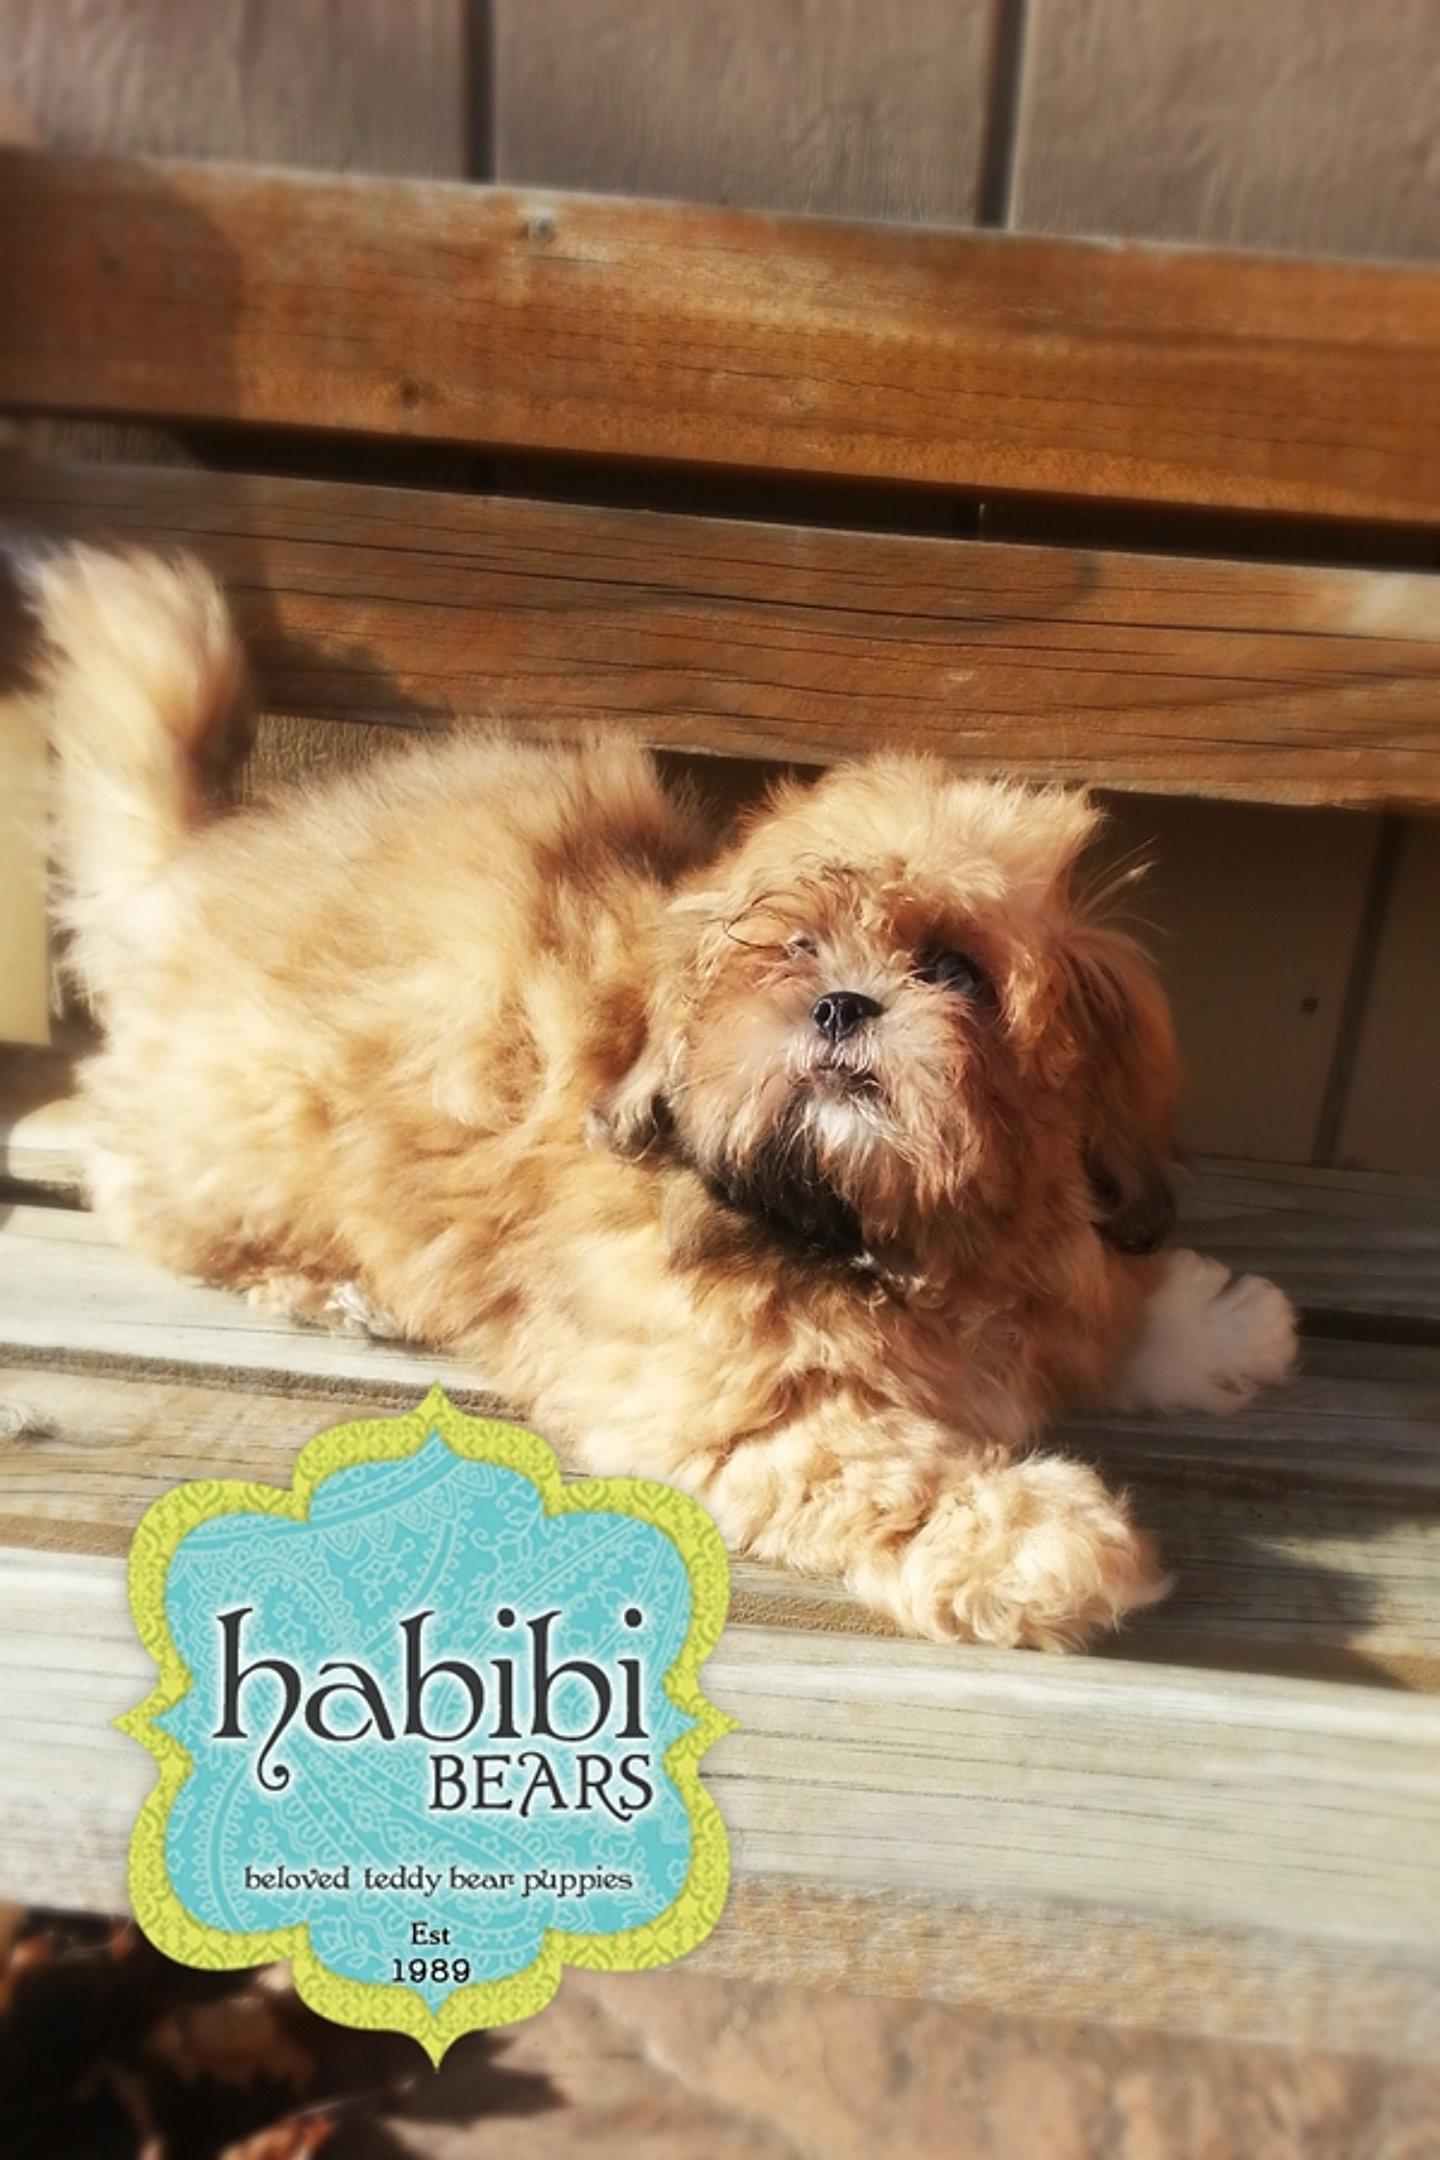 Habibi Bear Dog Breed